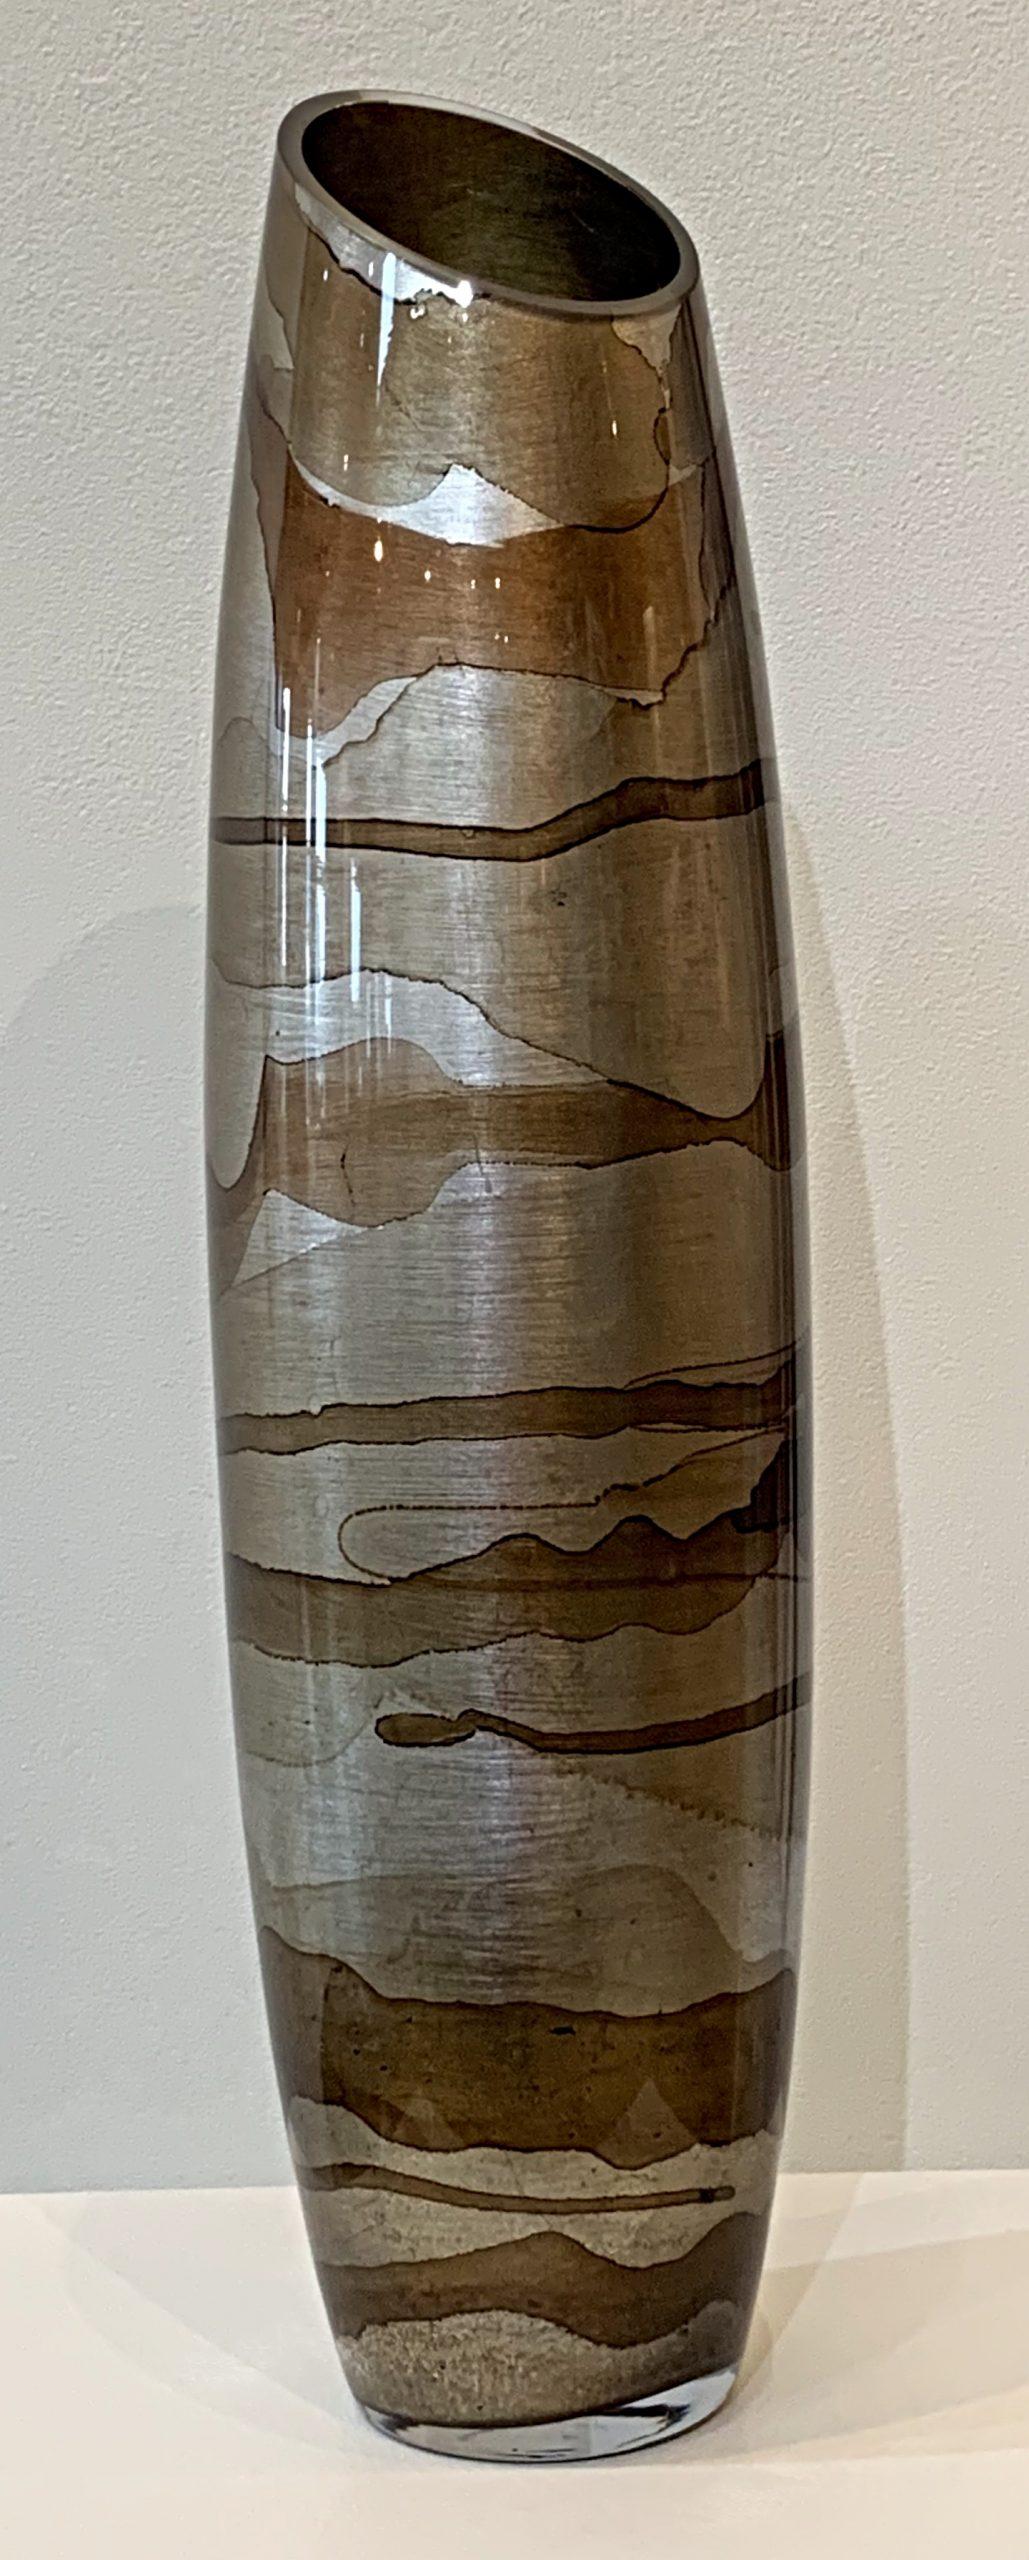 Medium bronze bullet vase, hand gilded by David Graff | Effusion Art Gallery + Cast Glass Studio, Invermere BC